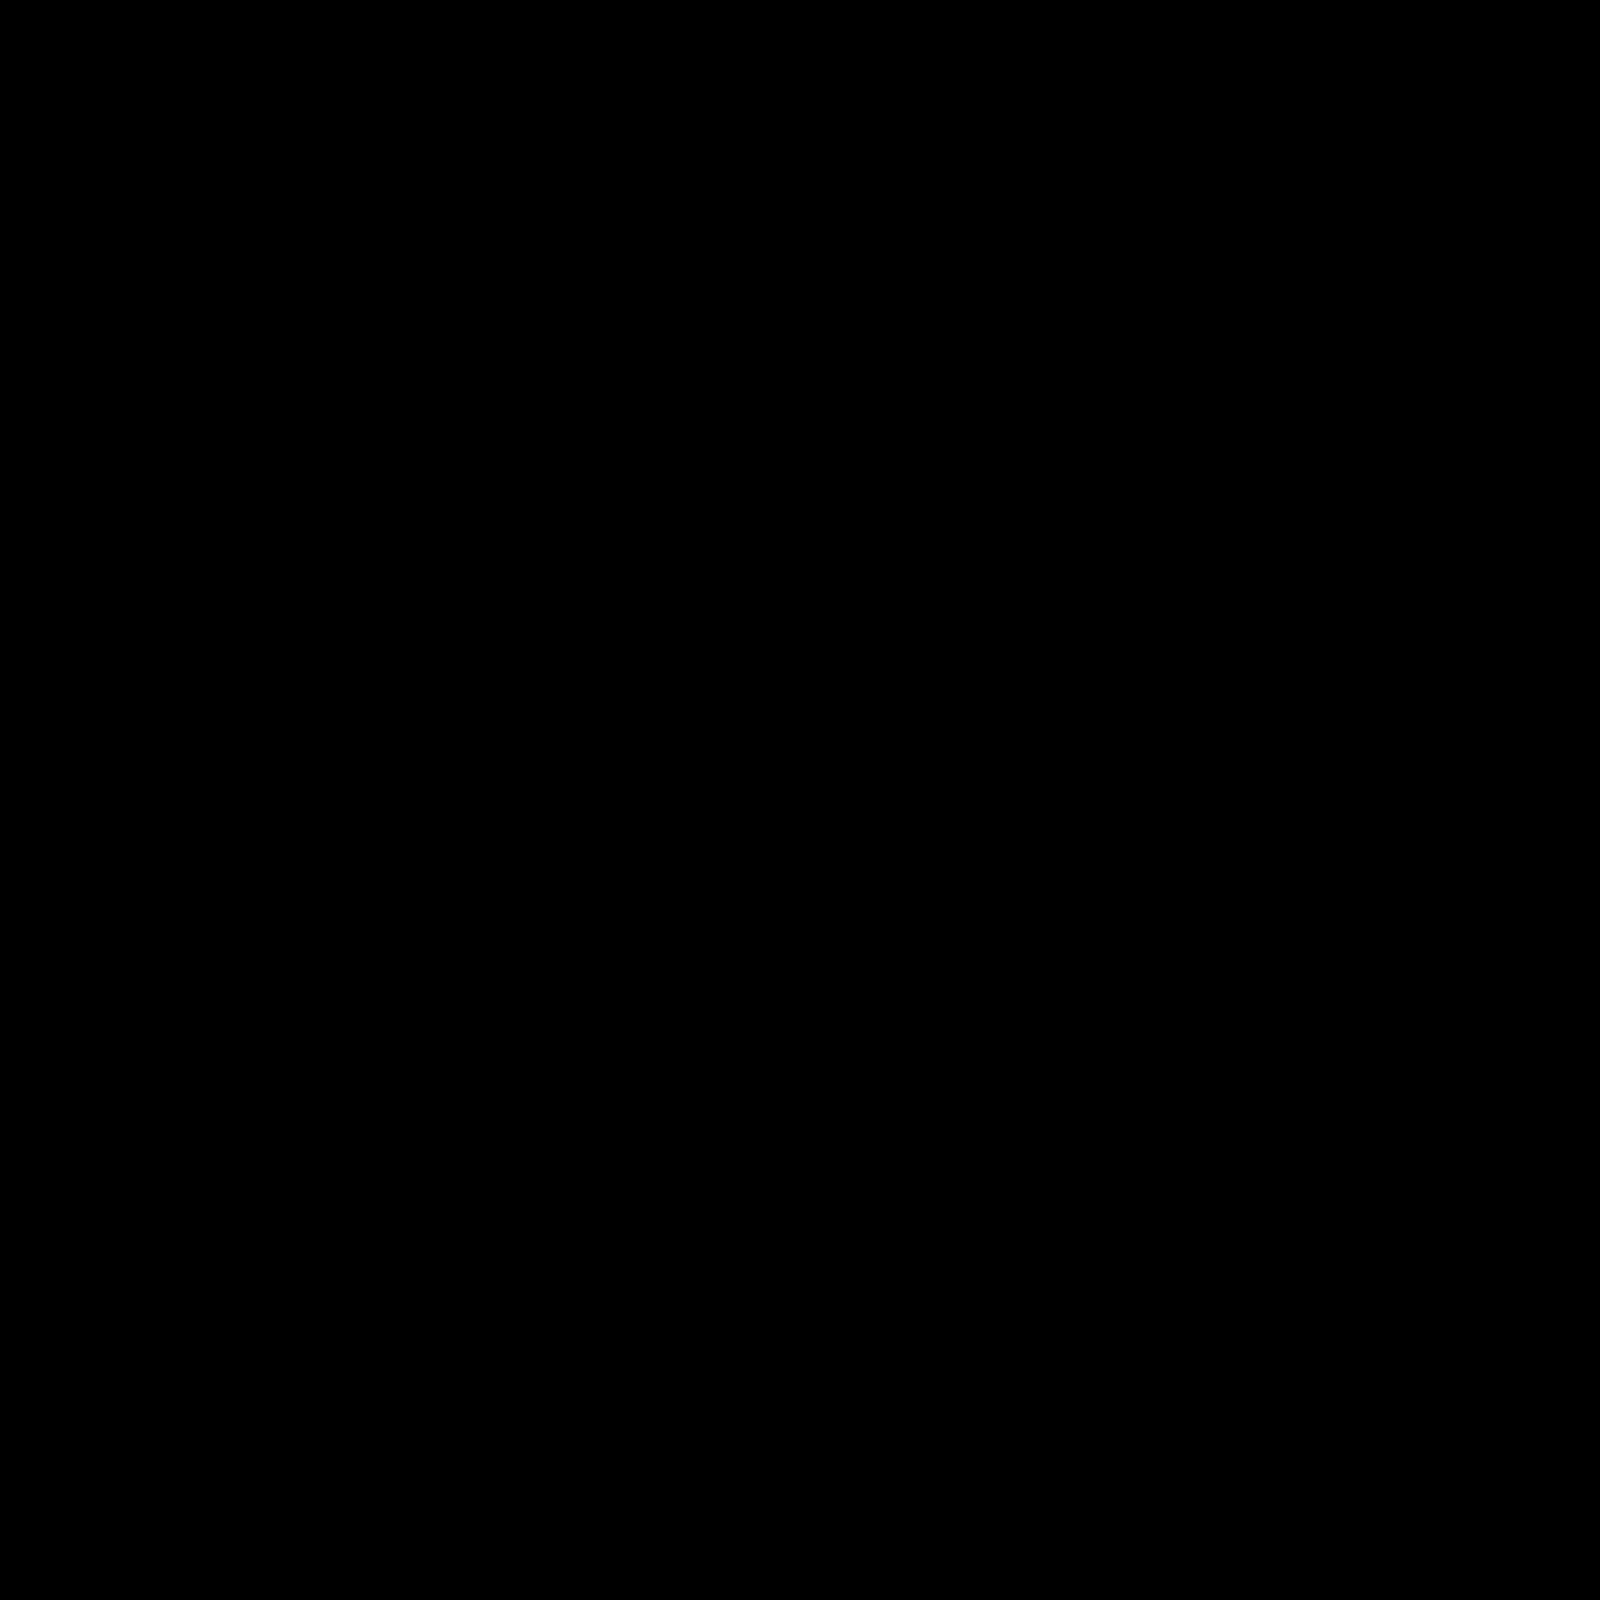 3 Season icon